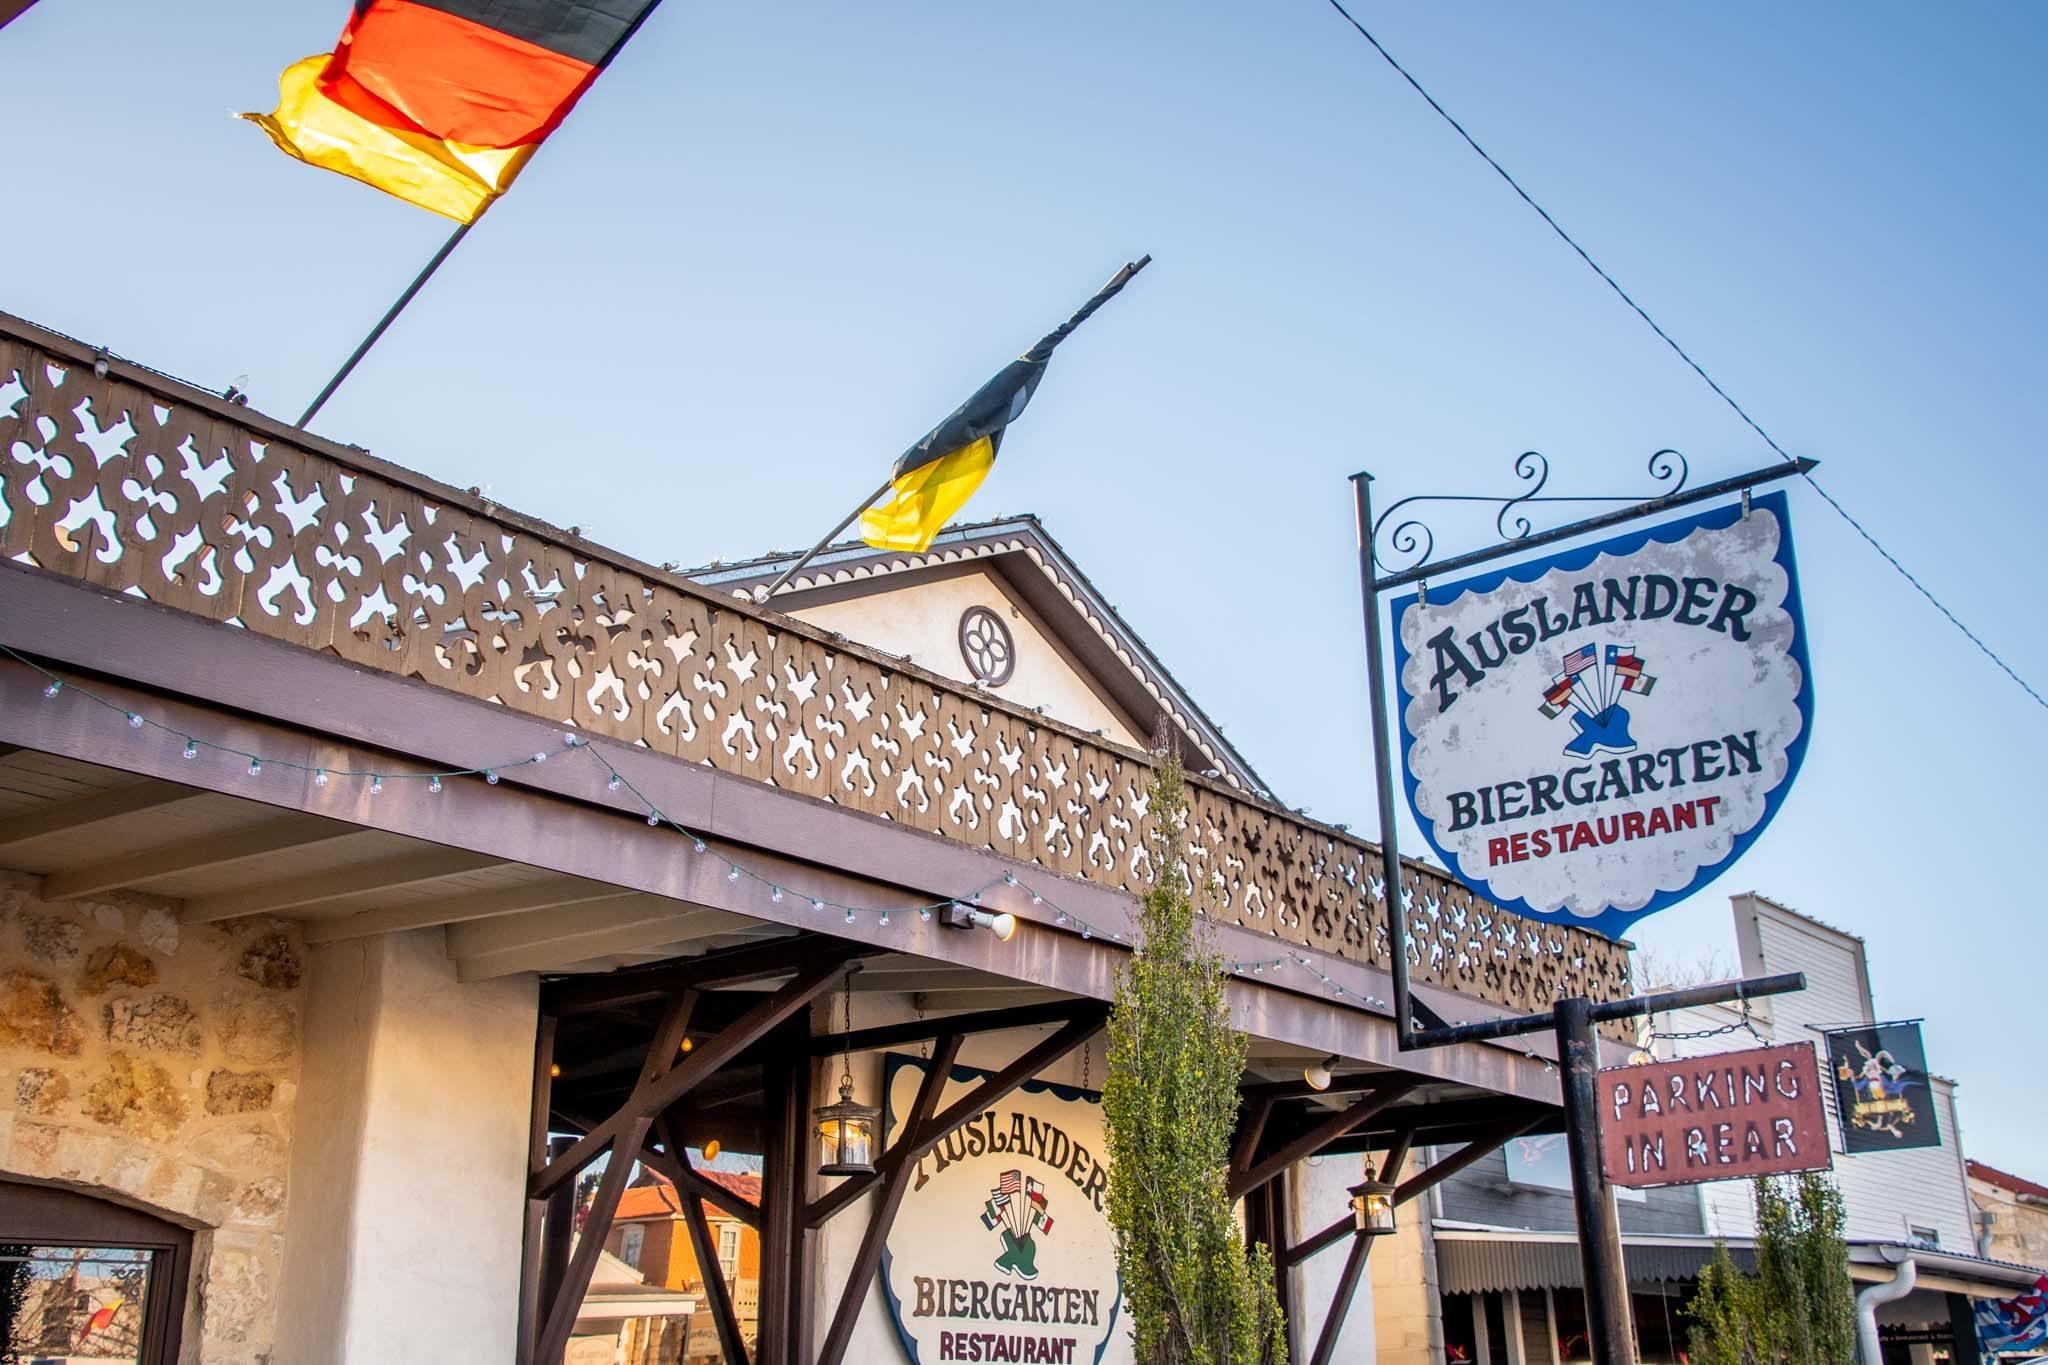 Exterior of a restaurant with sign: Auslander Biergarten Restaurant